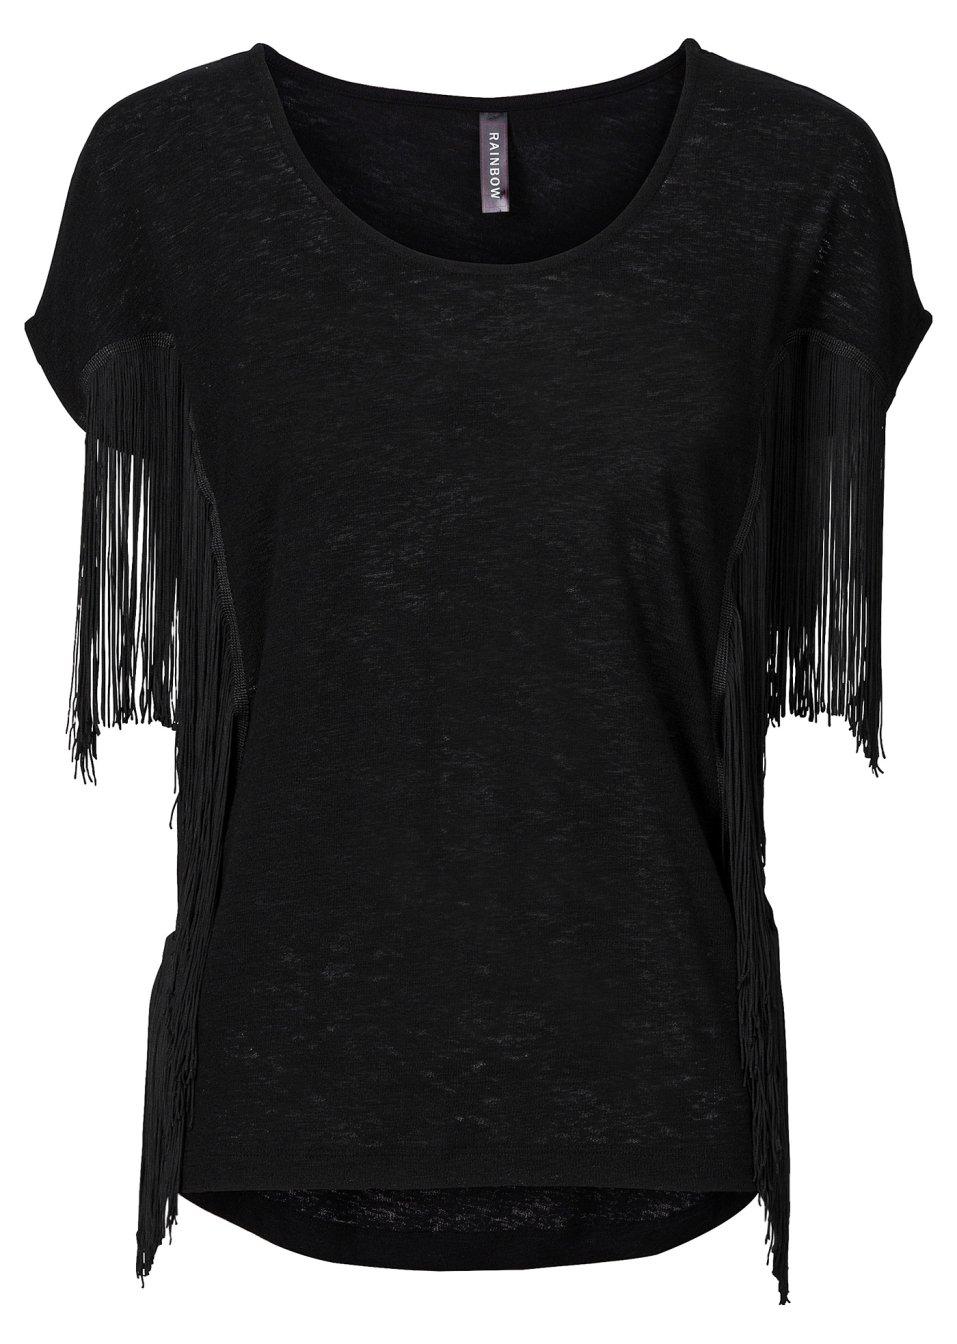 stylishes shirt mit fransen schwarz. Black Bedroom Furniture Sets. Home Design Ideas